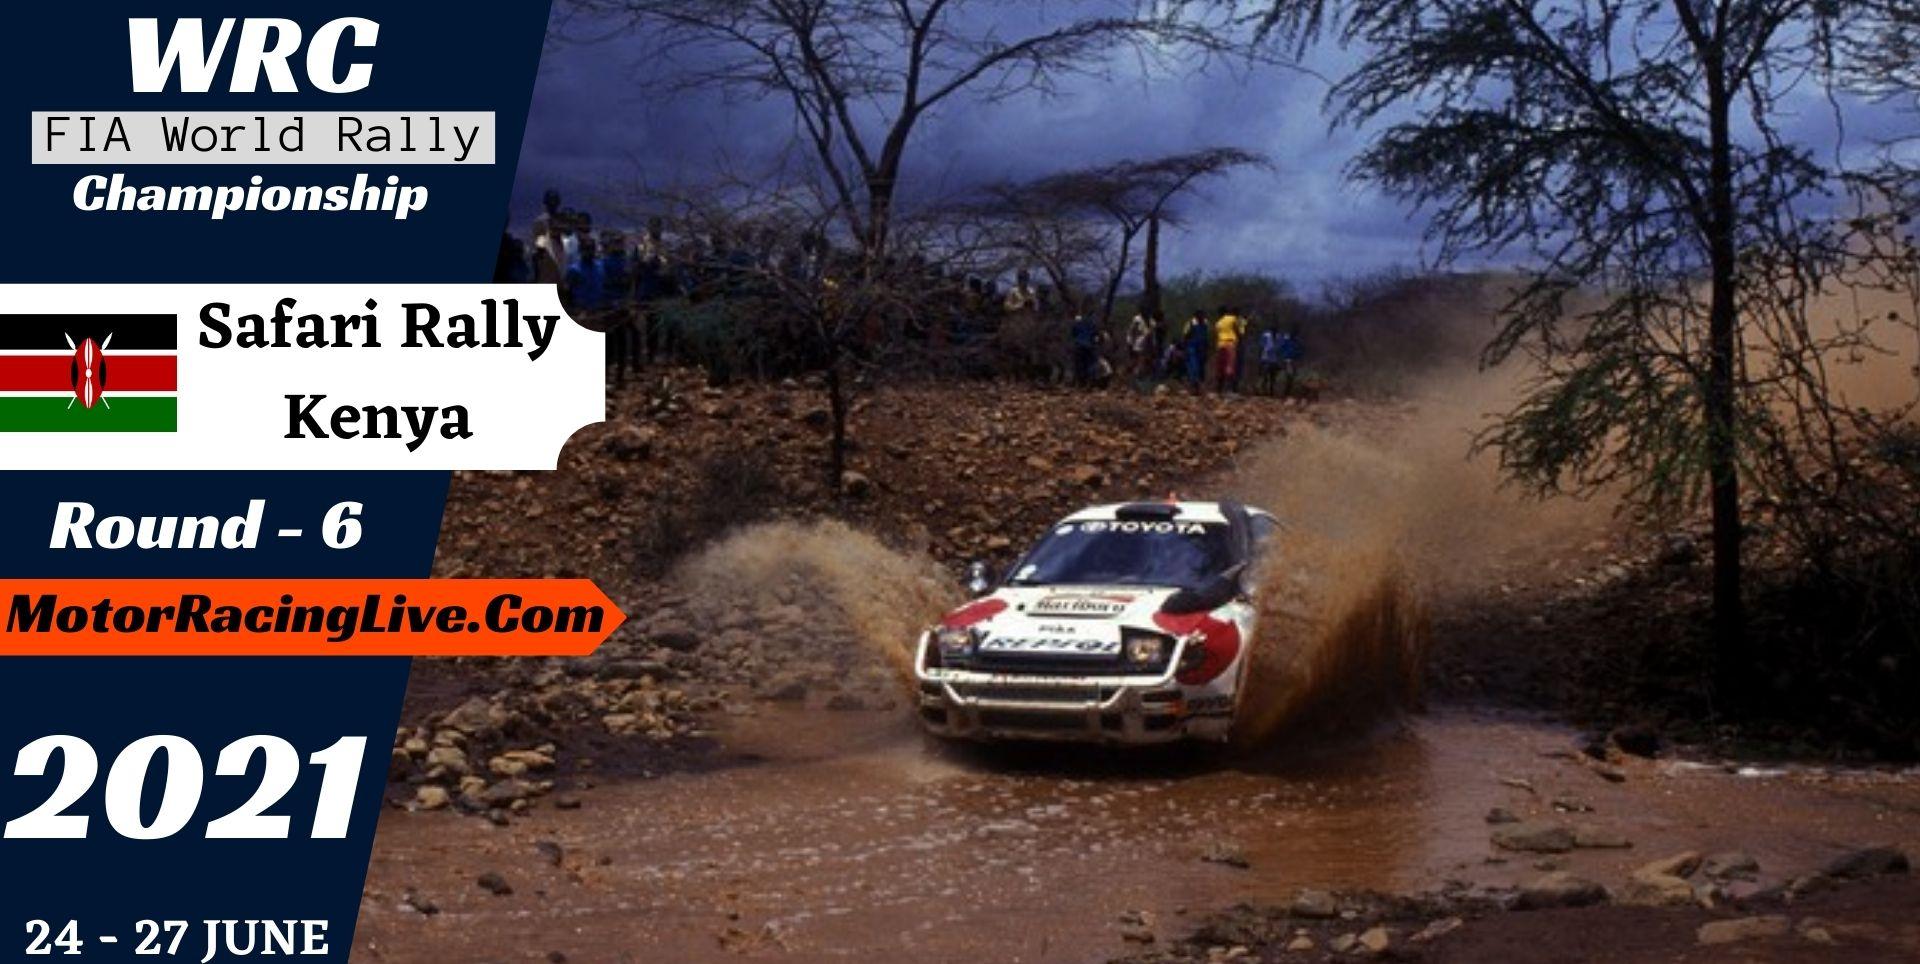 WRC Safari Rally Kenya Round 6 Live Stream 2021